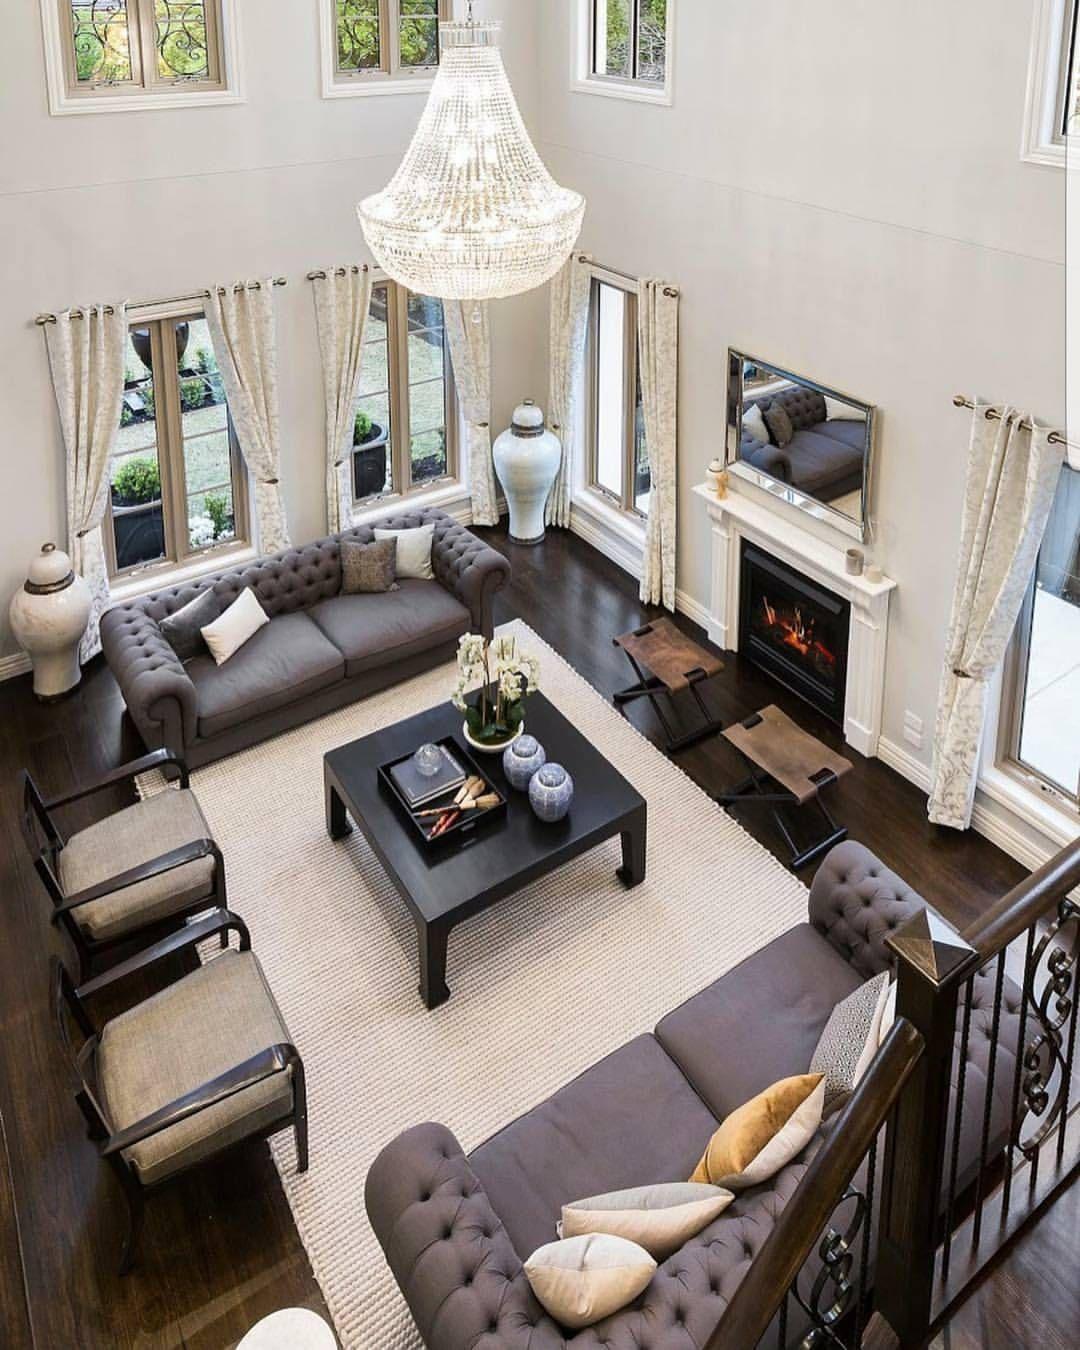 Second Floor Loft Small Loft Spaces Living Room Loft Loft Decor